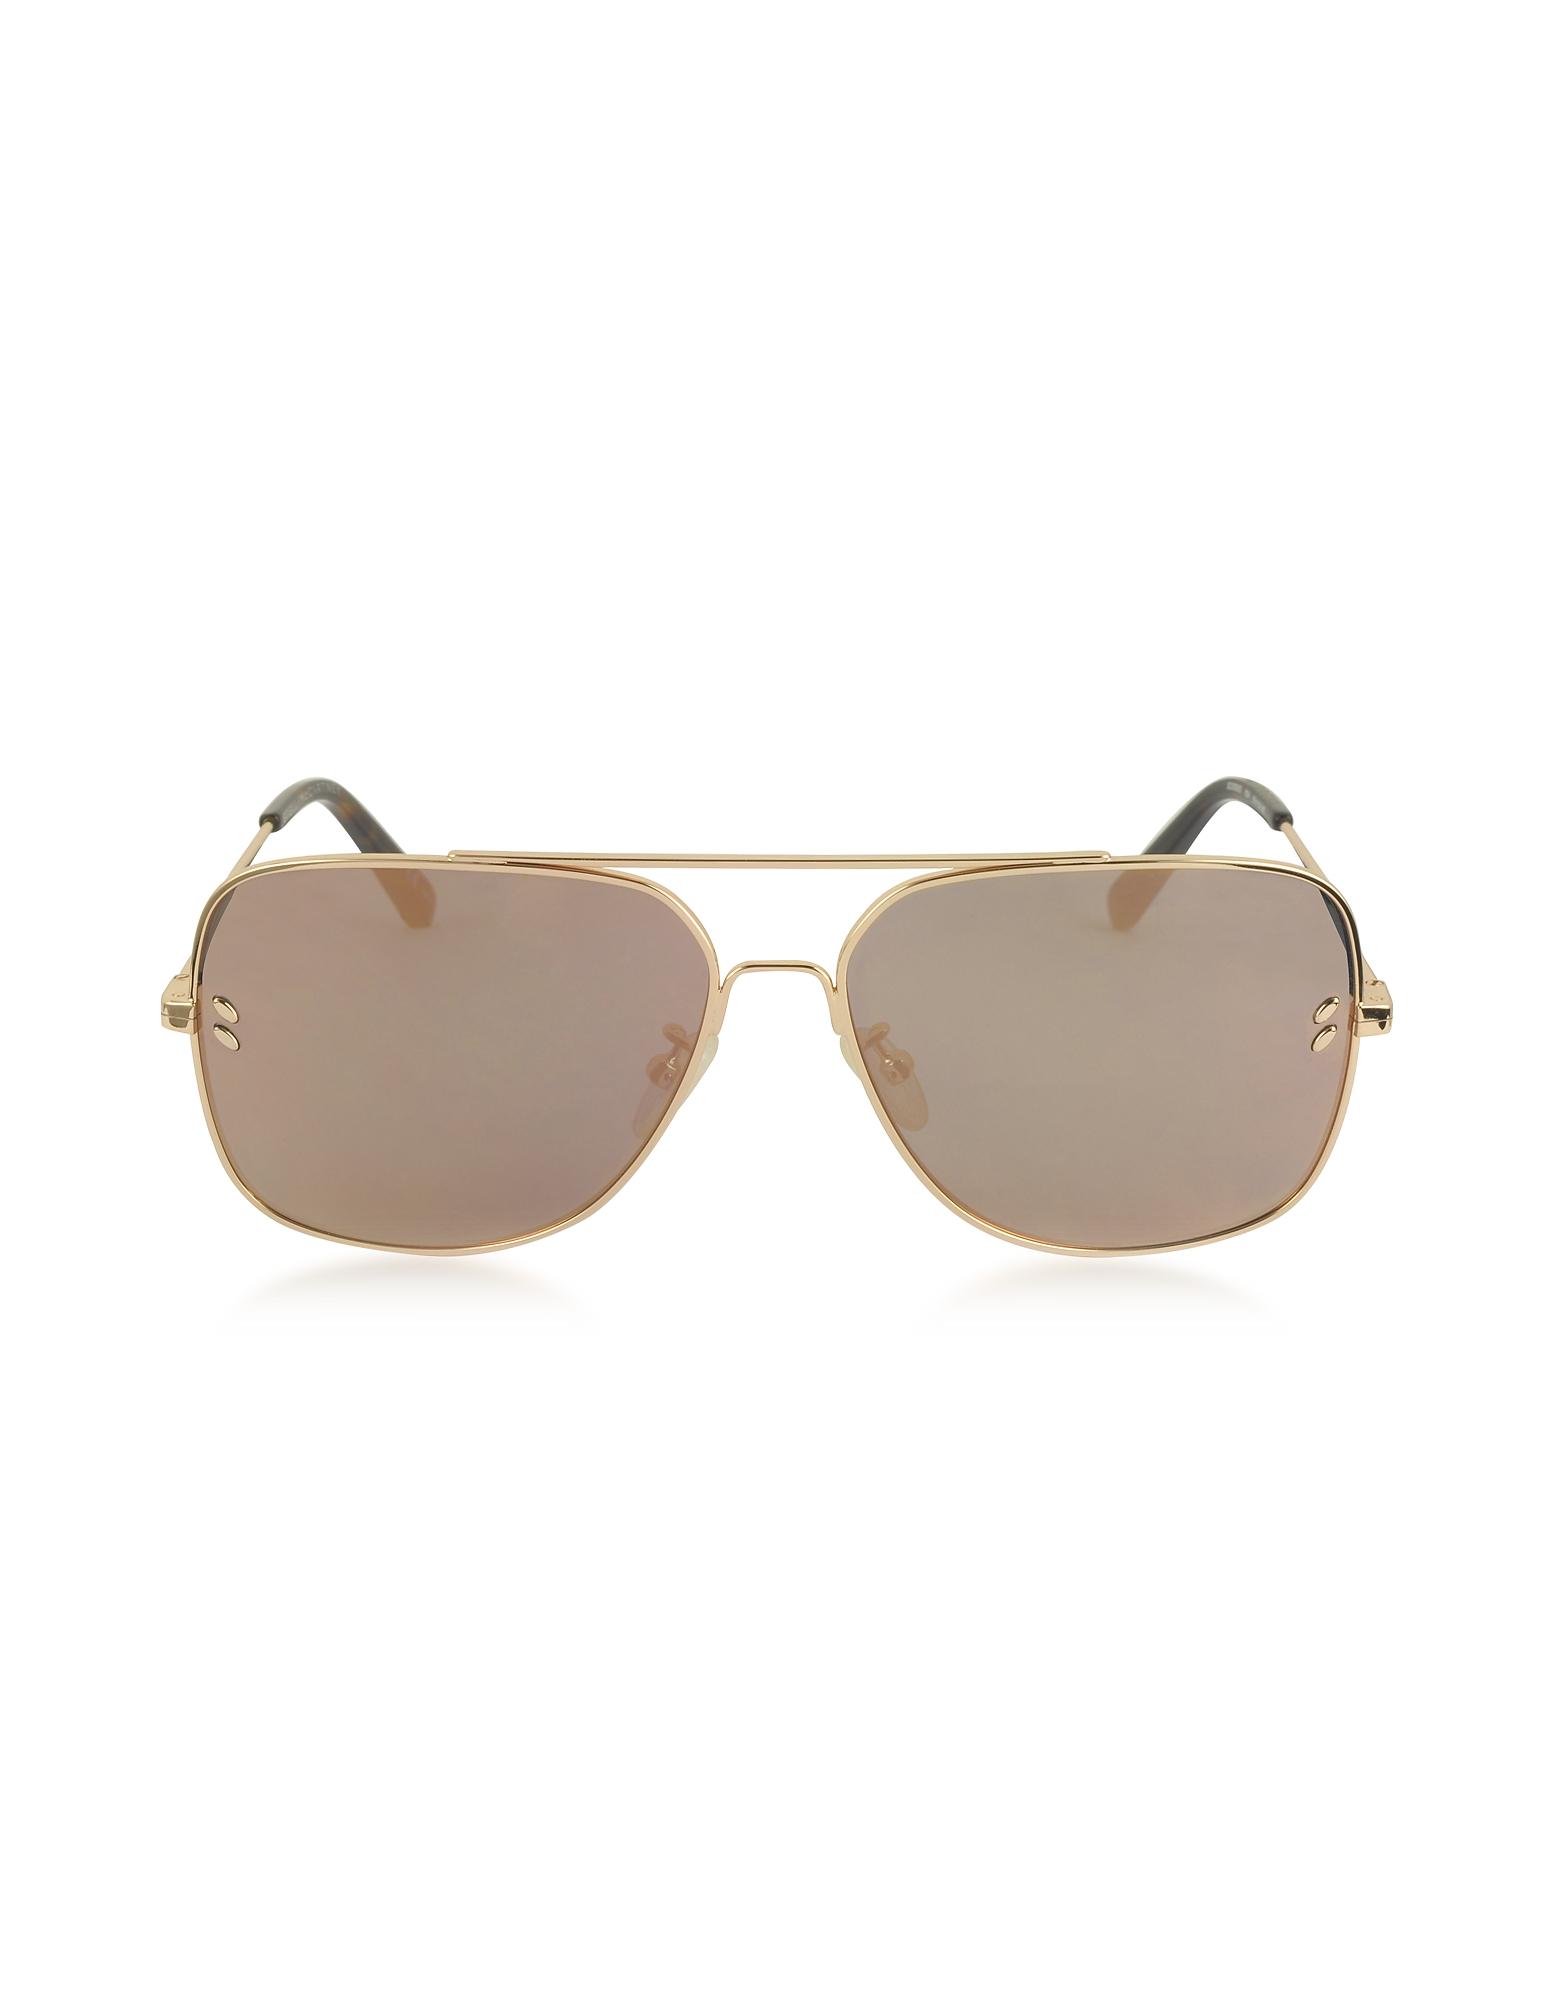 Stella McCartney Sunglasses, SC0055S Gold Metal Aviator Unisex Sunglasses